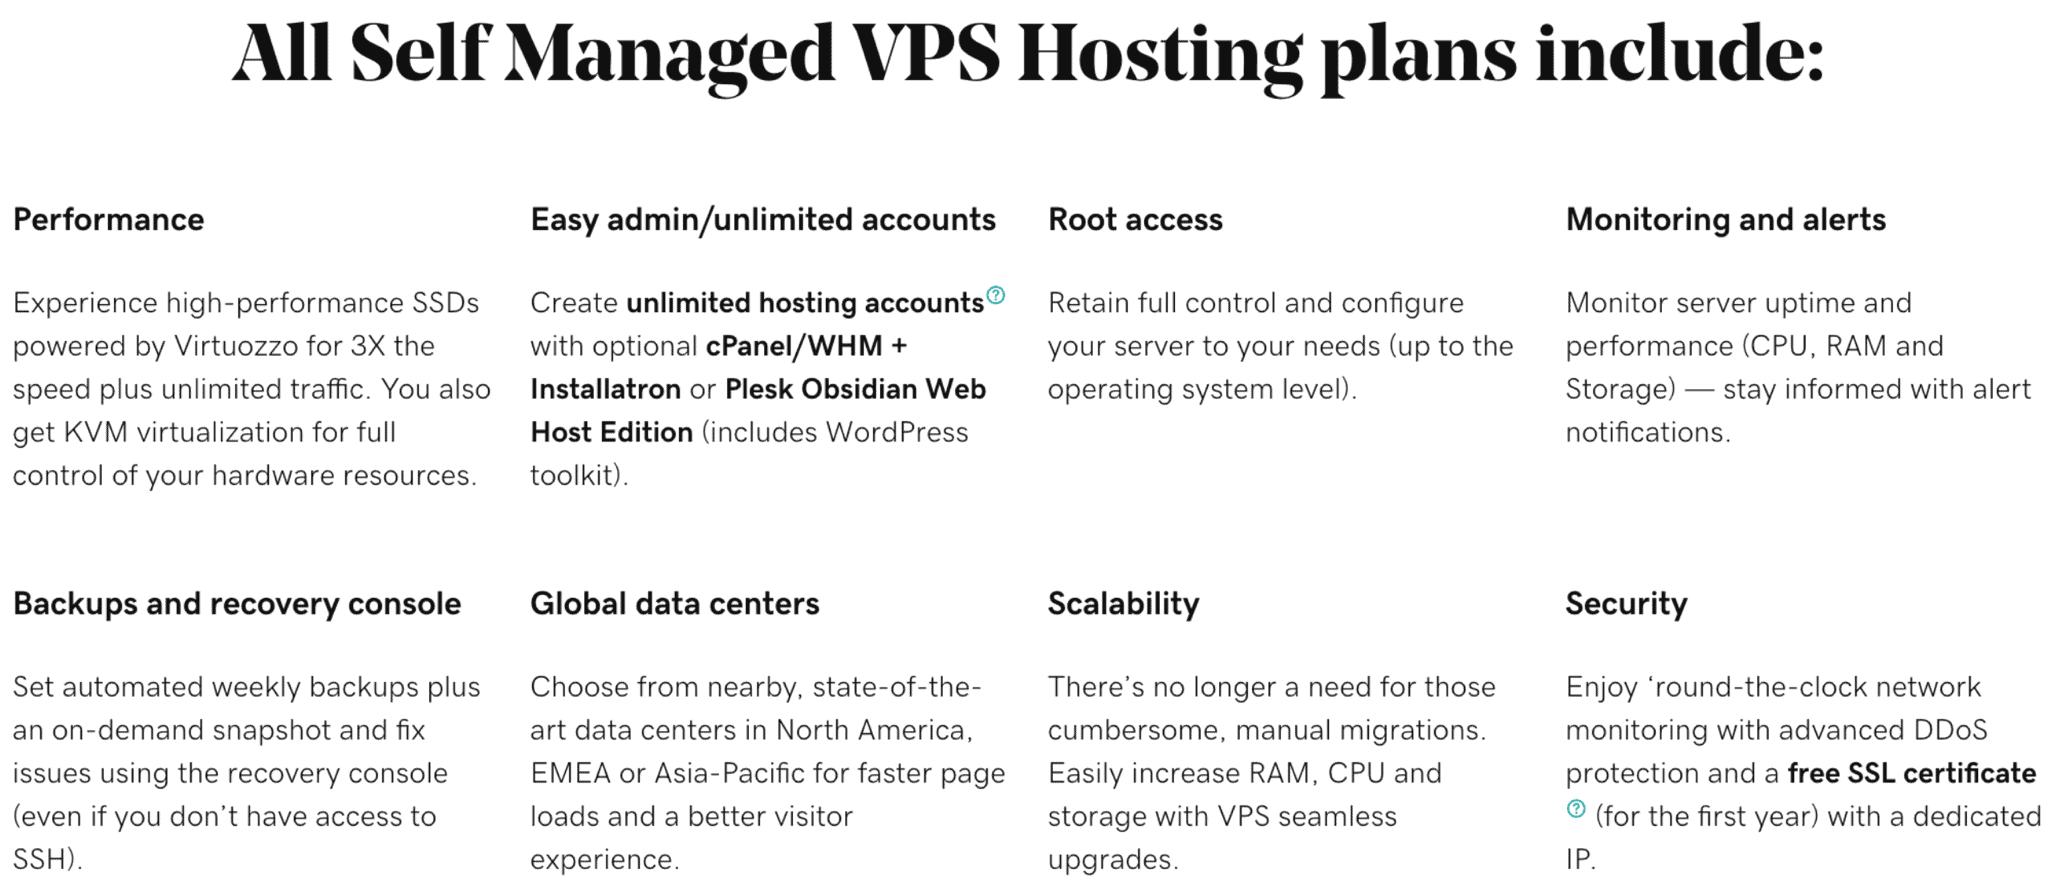 Details of GoDaddy's VPS hosting plans